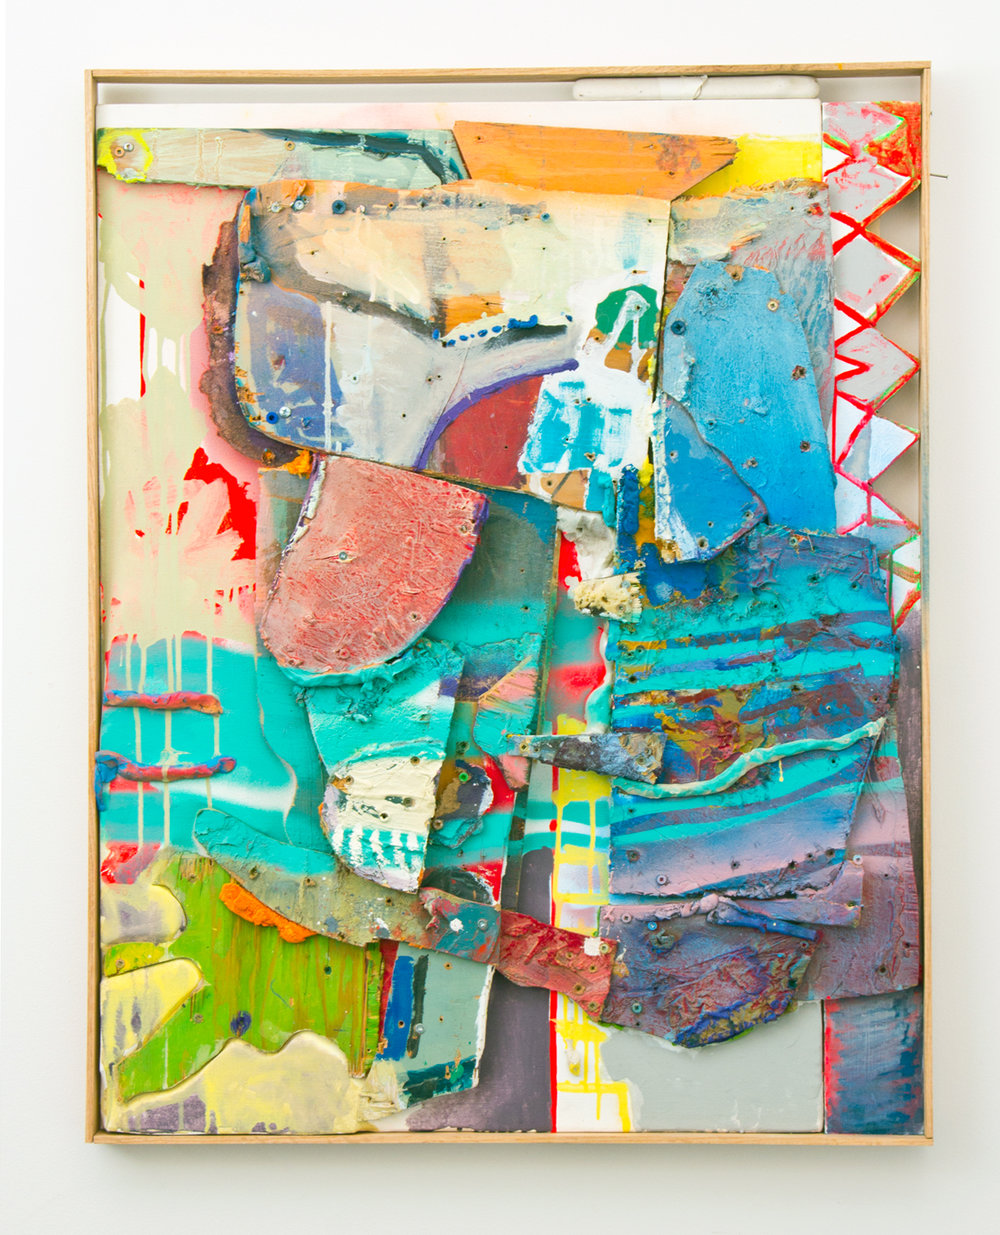 James Gardner_FEBFOGG_oil acrylic on canvas and wood.jpg